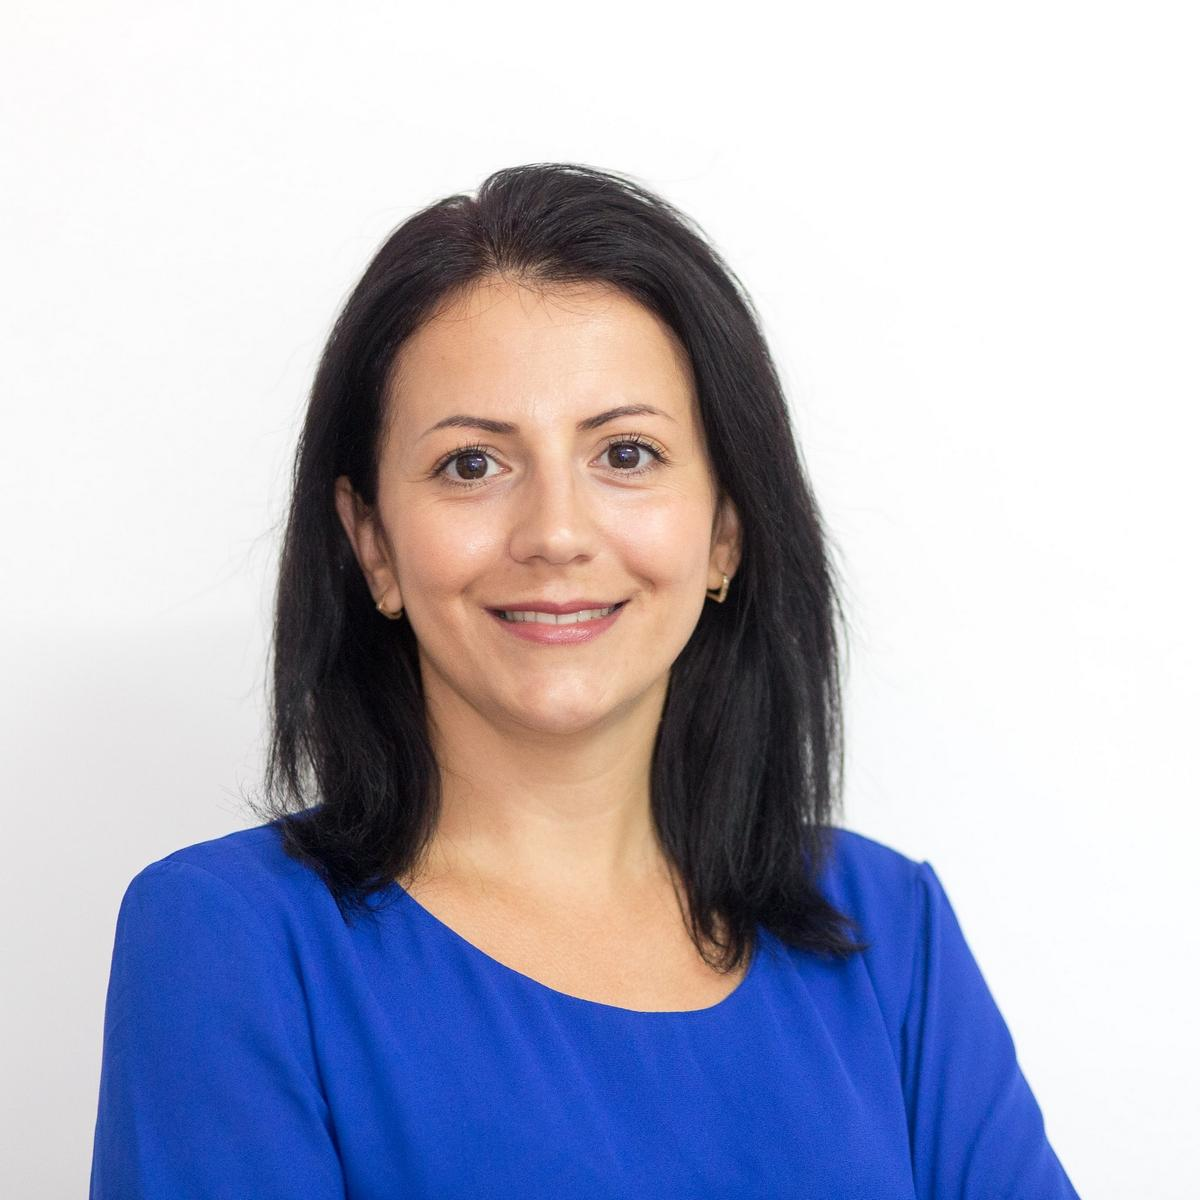 Adriana Balsanu